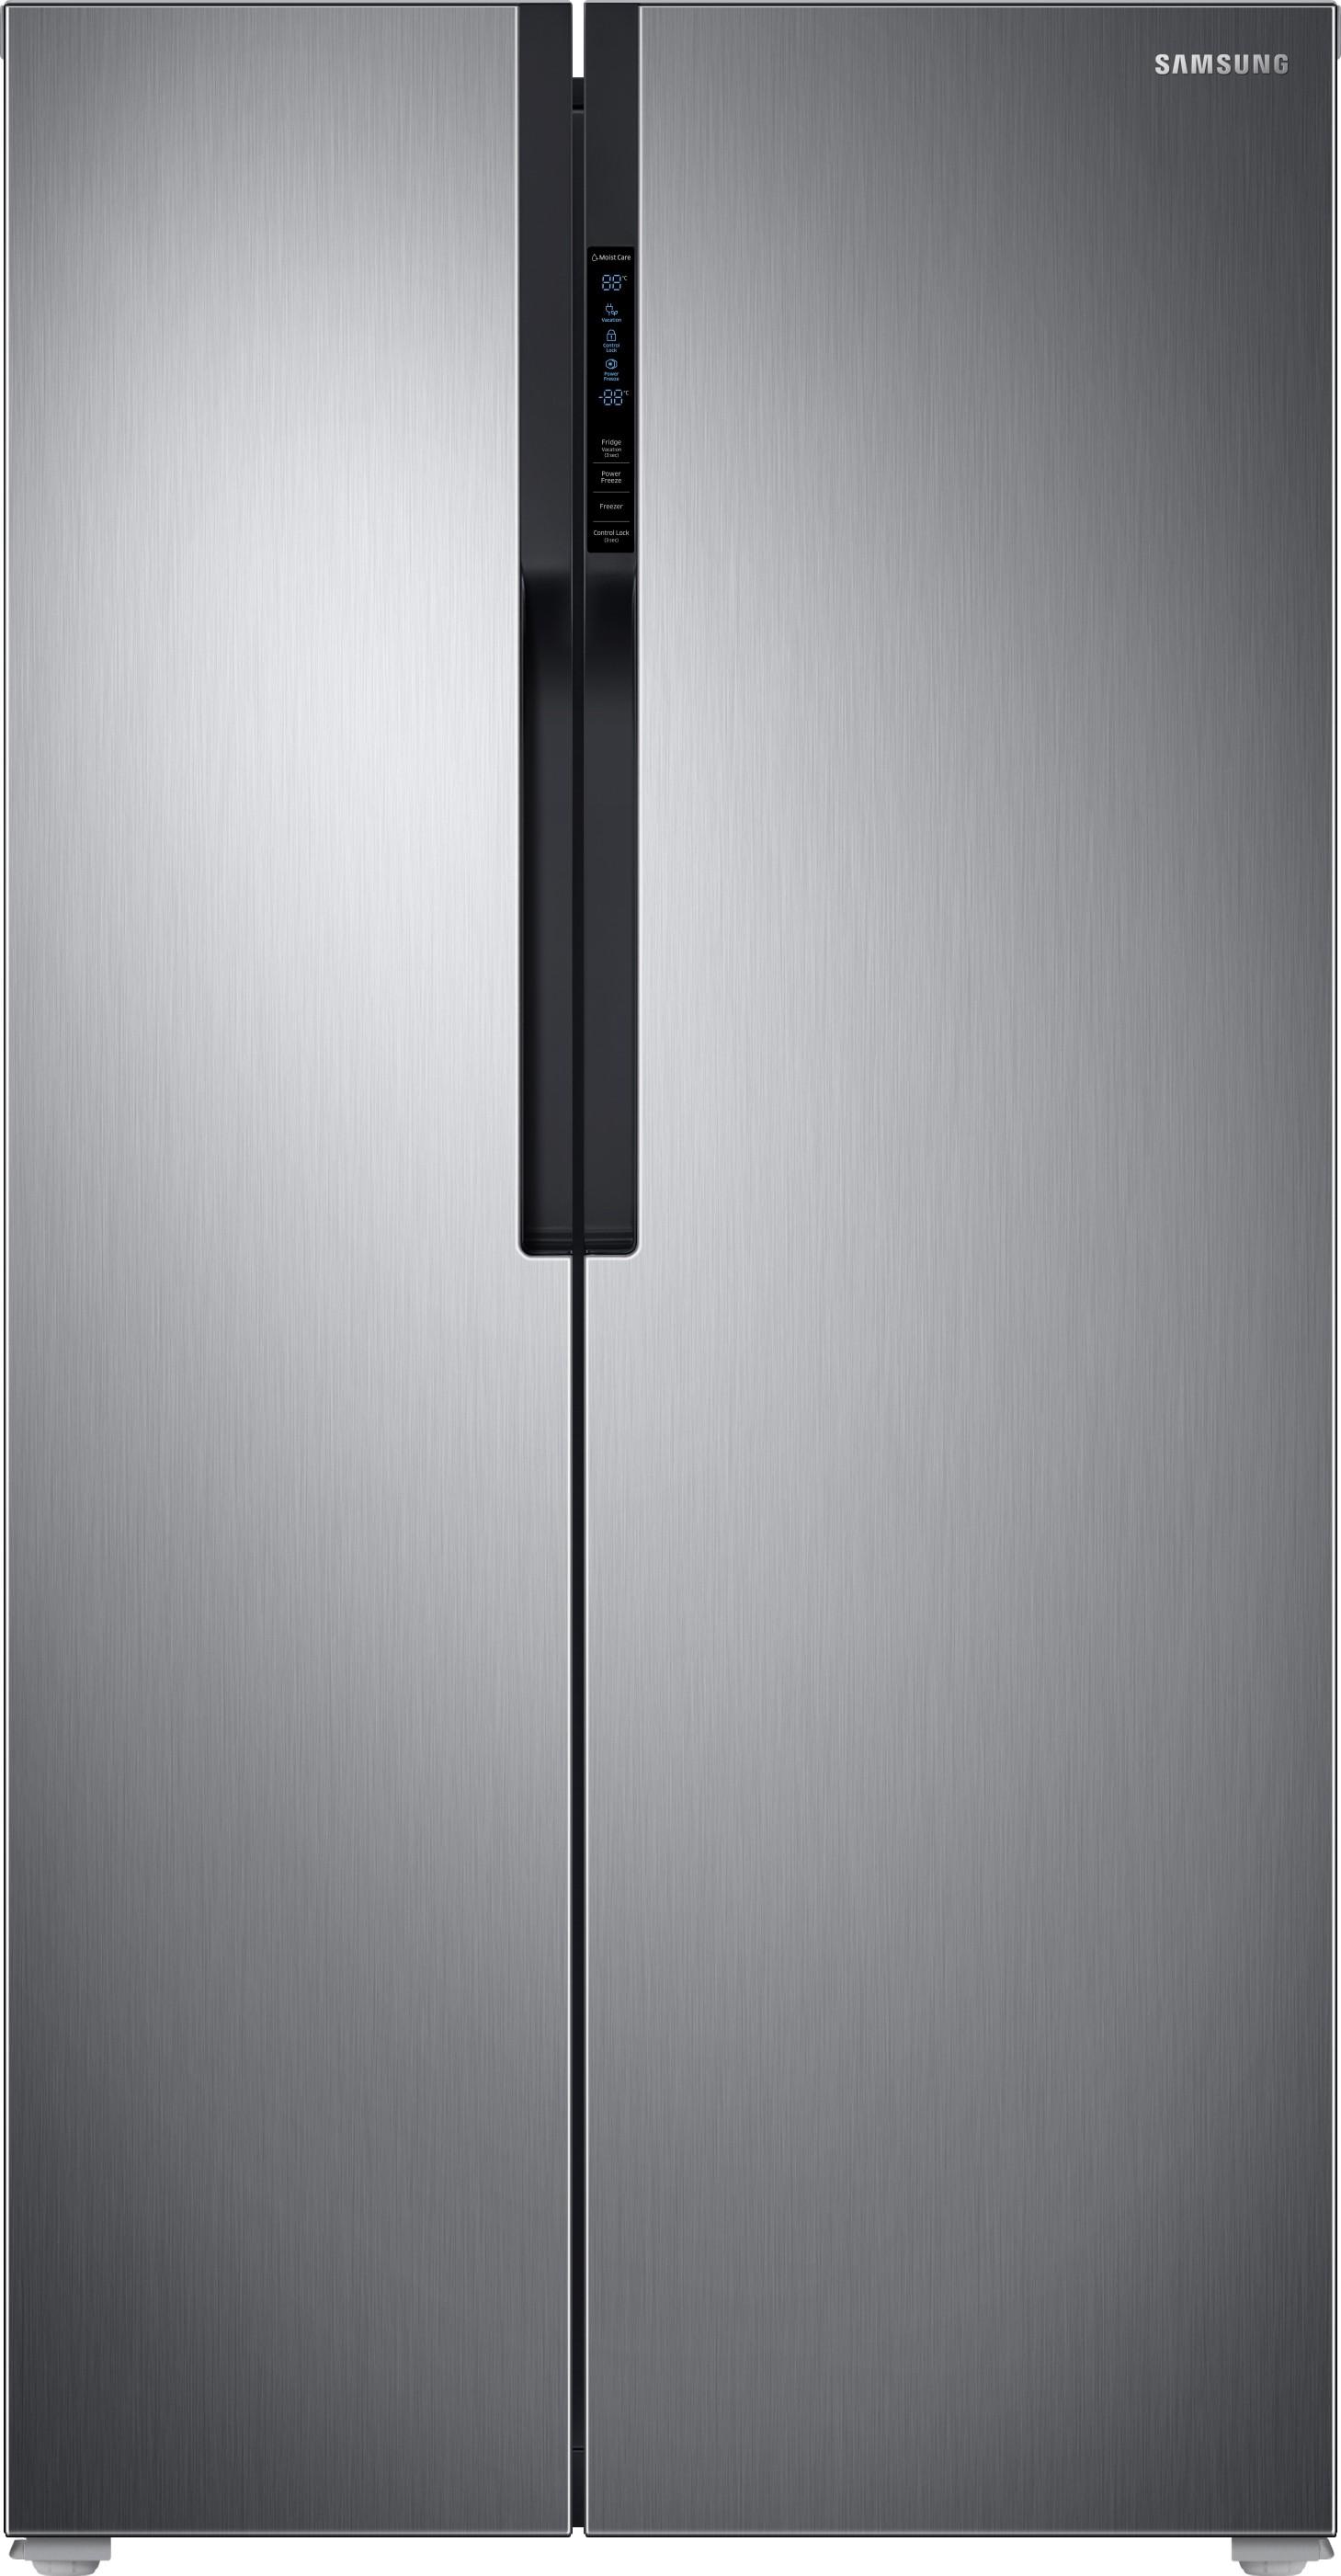 SAMSUNG 604 L Frost Free Side by Side Refrigerator(RS55K5010S9/TL, Refined Inox(Matt Doi Metal), 2017) (Samsung) Tamil Nadu Buy Online